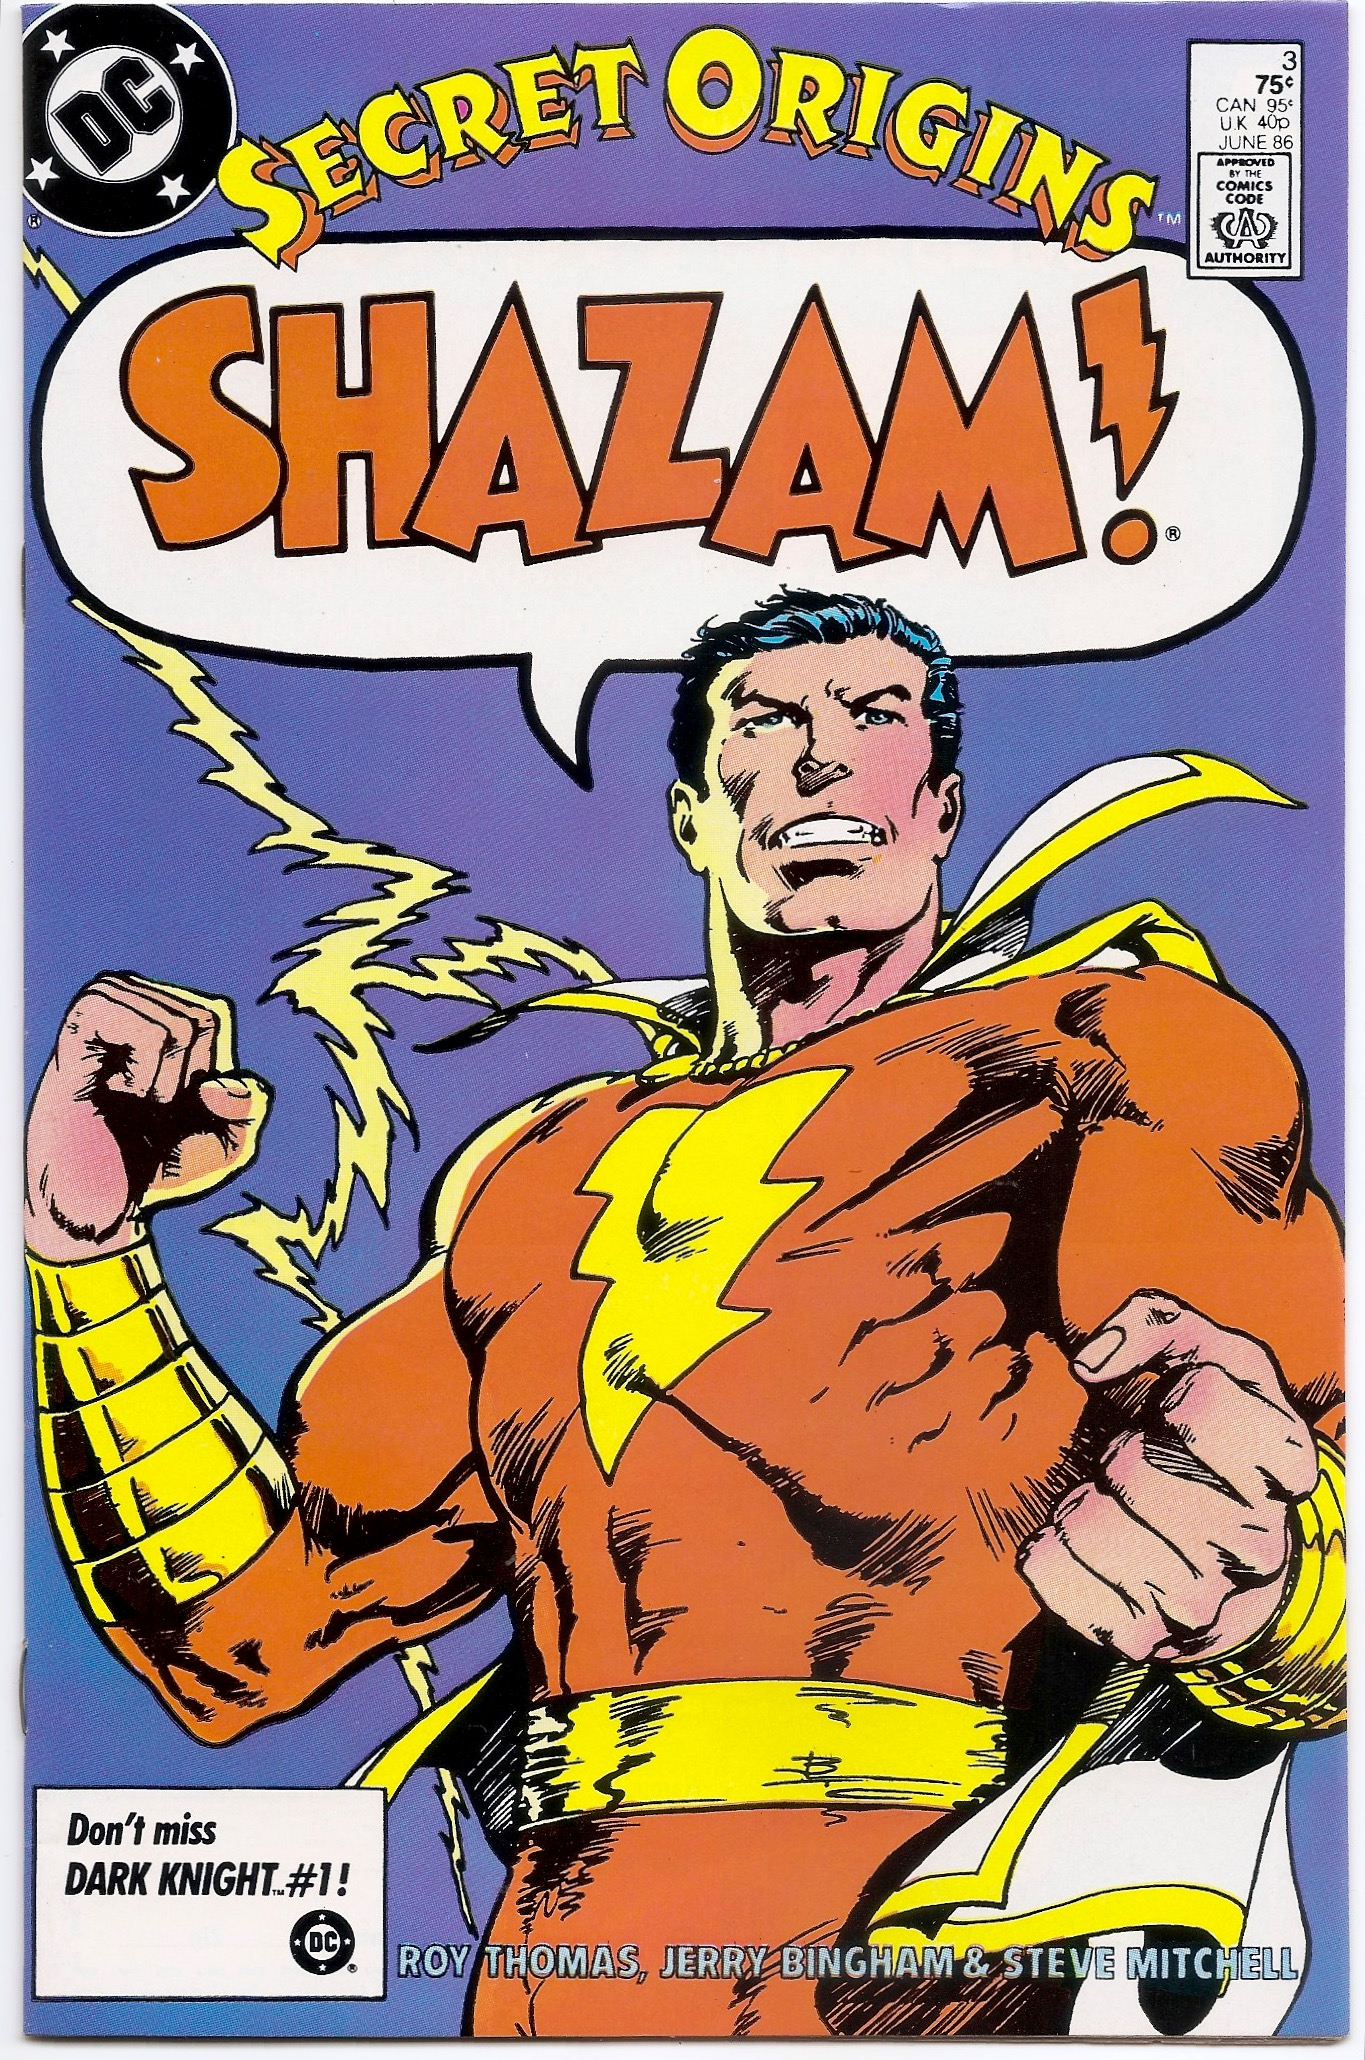 secret origins # 03 captain marvel shazam! origin